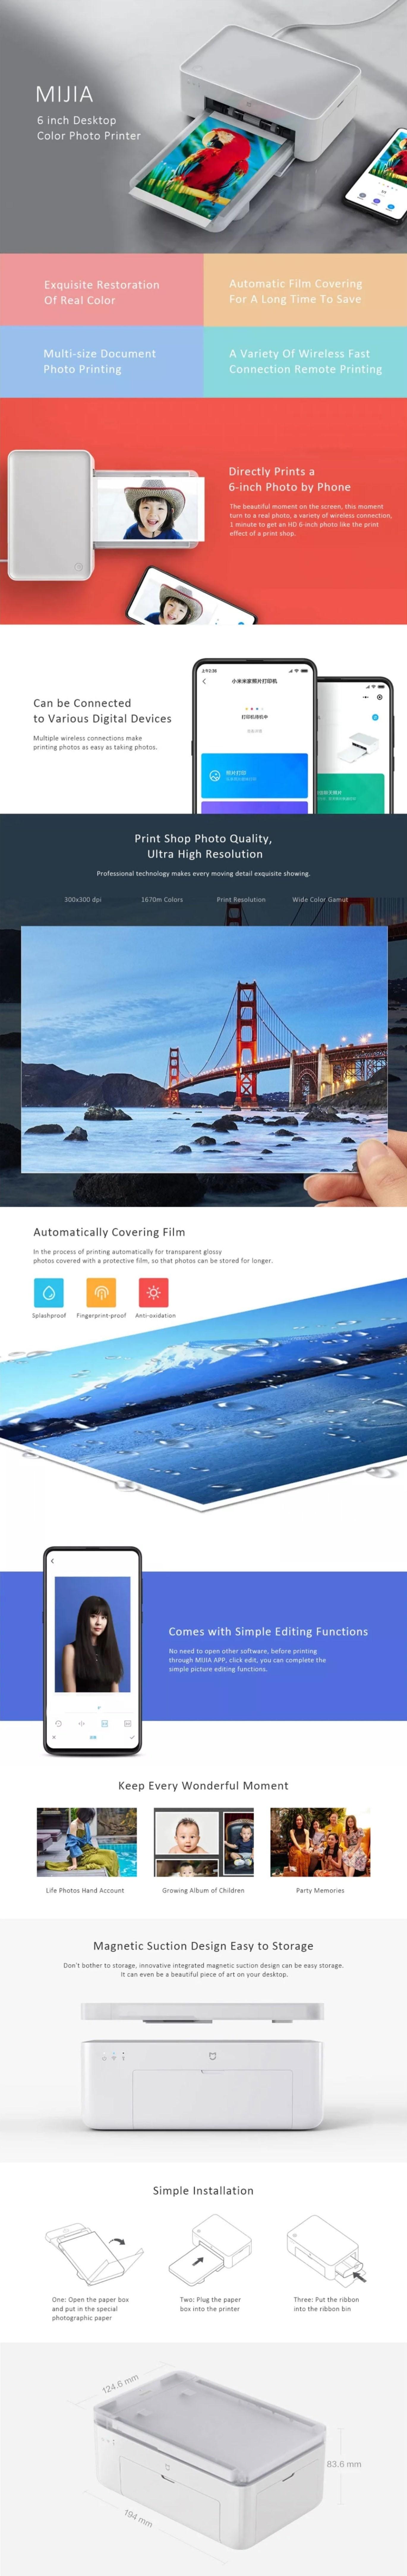 Prezentare-Xiaomi-AirPrint69bb558d489351f6.jpg